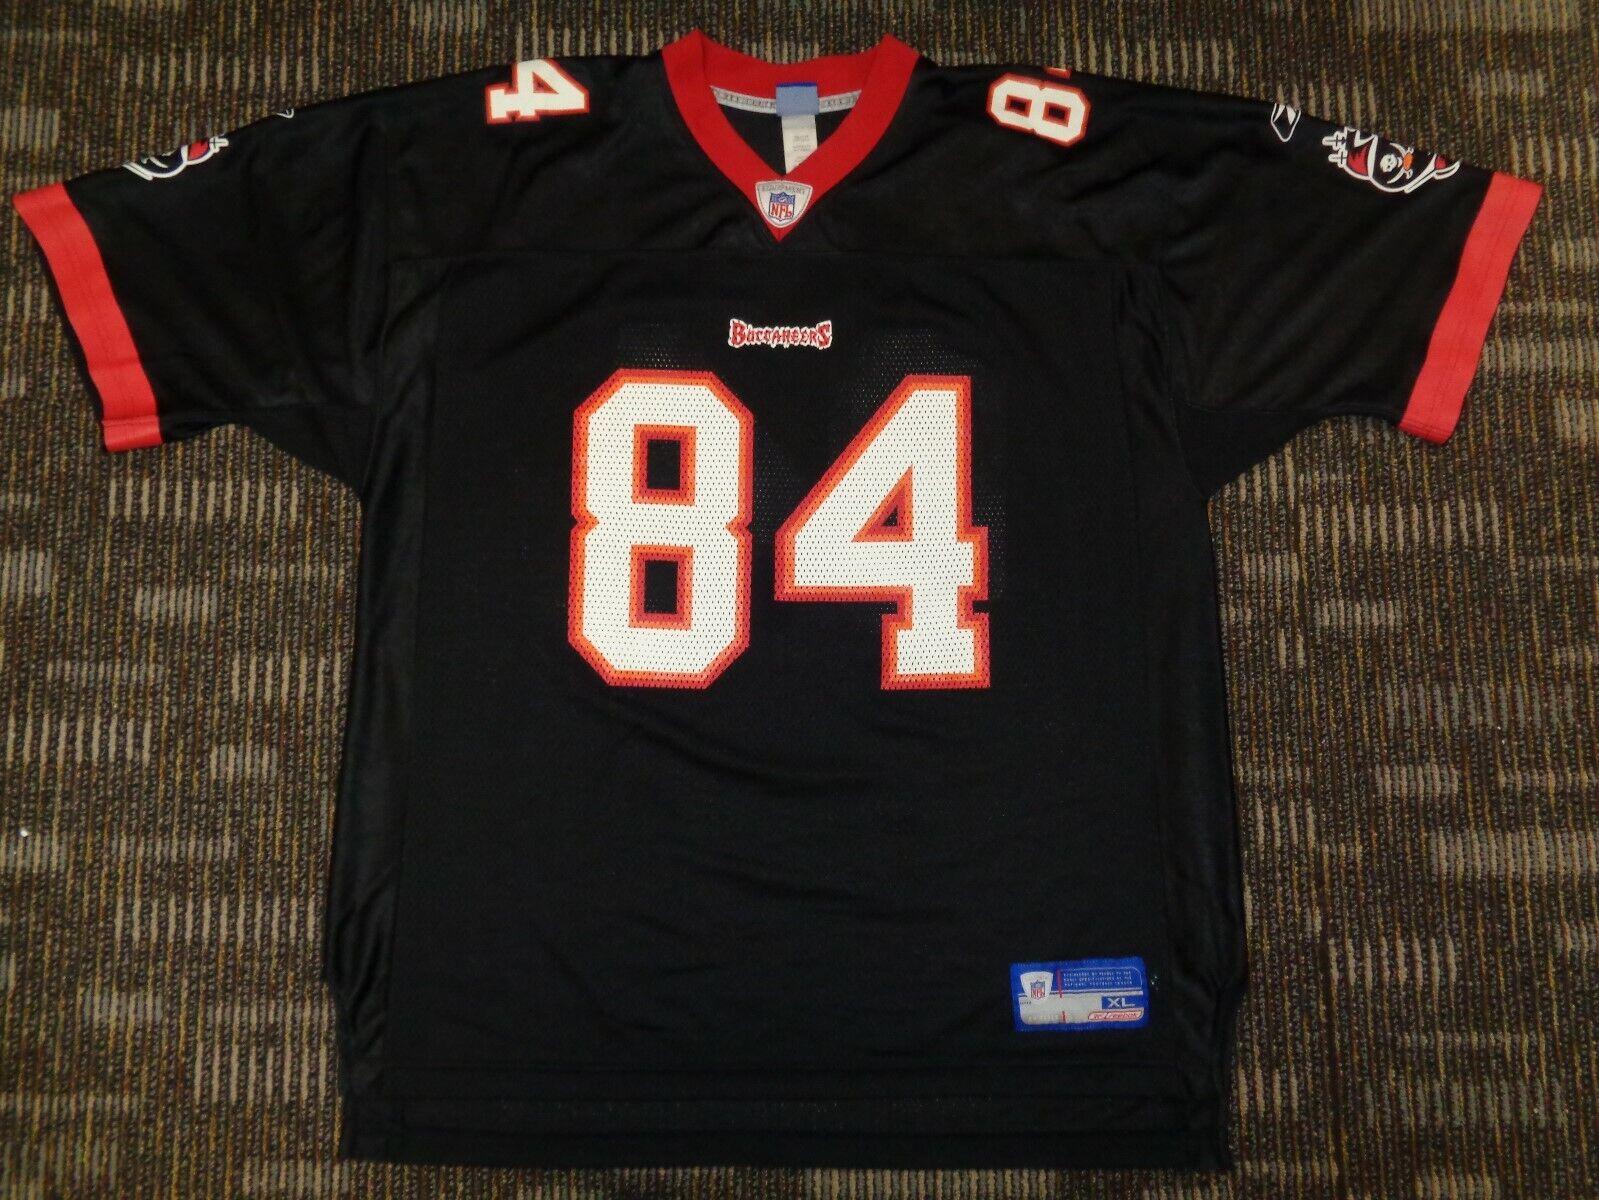 JOE JOEY GALLOWAY 84 TAMPA BAY BUCCANEERS REEBOK BLACK NFL GAME FOOTBALL JERSEY - $49.99